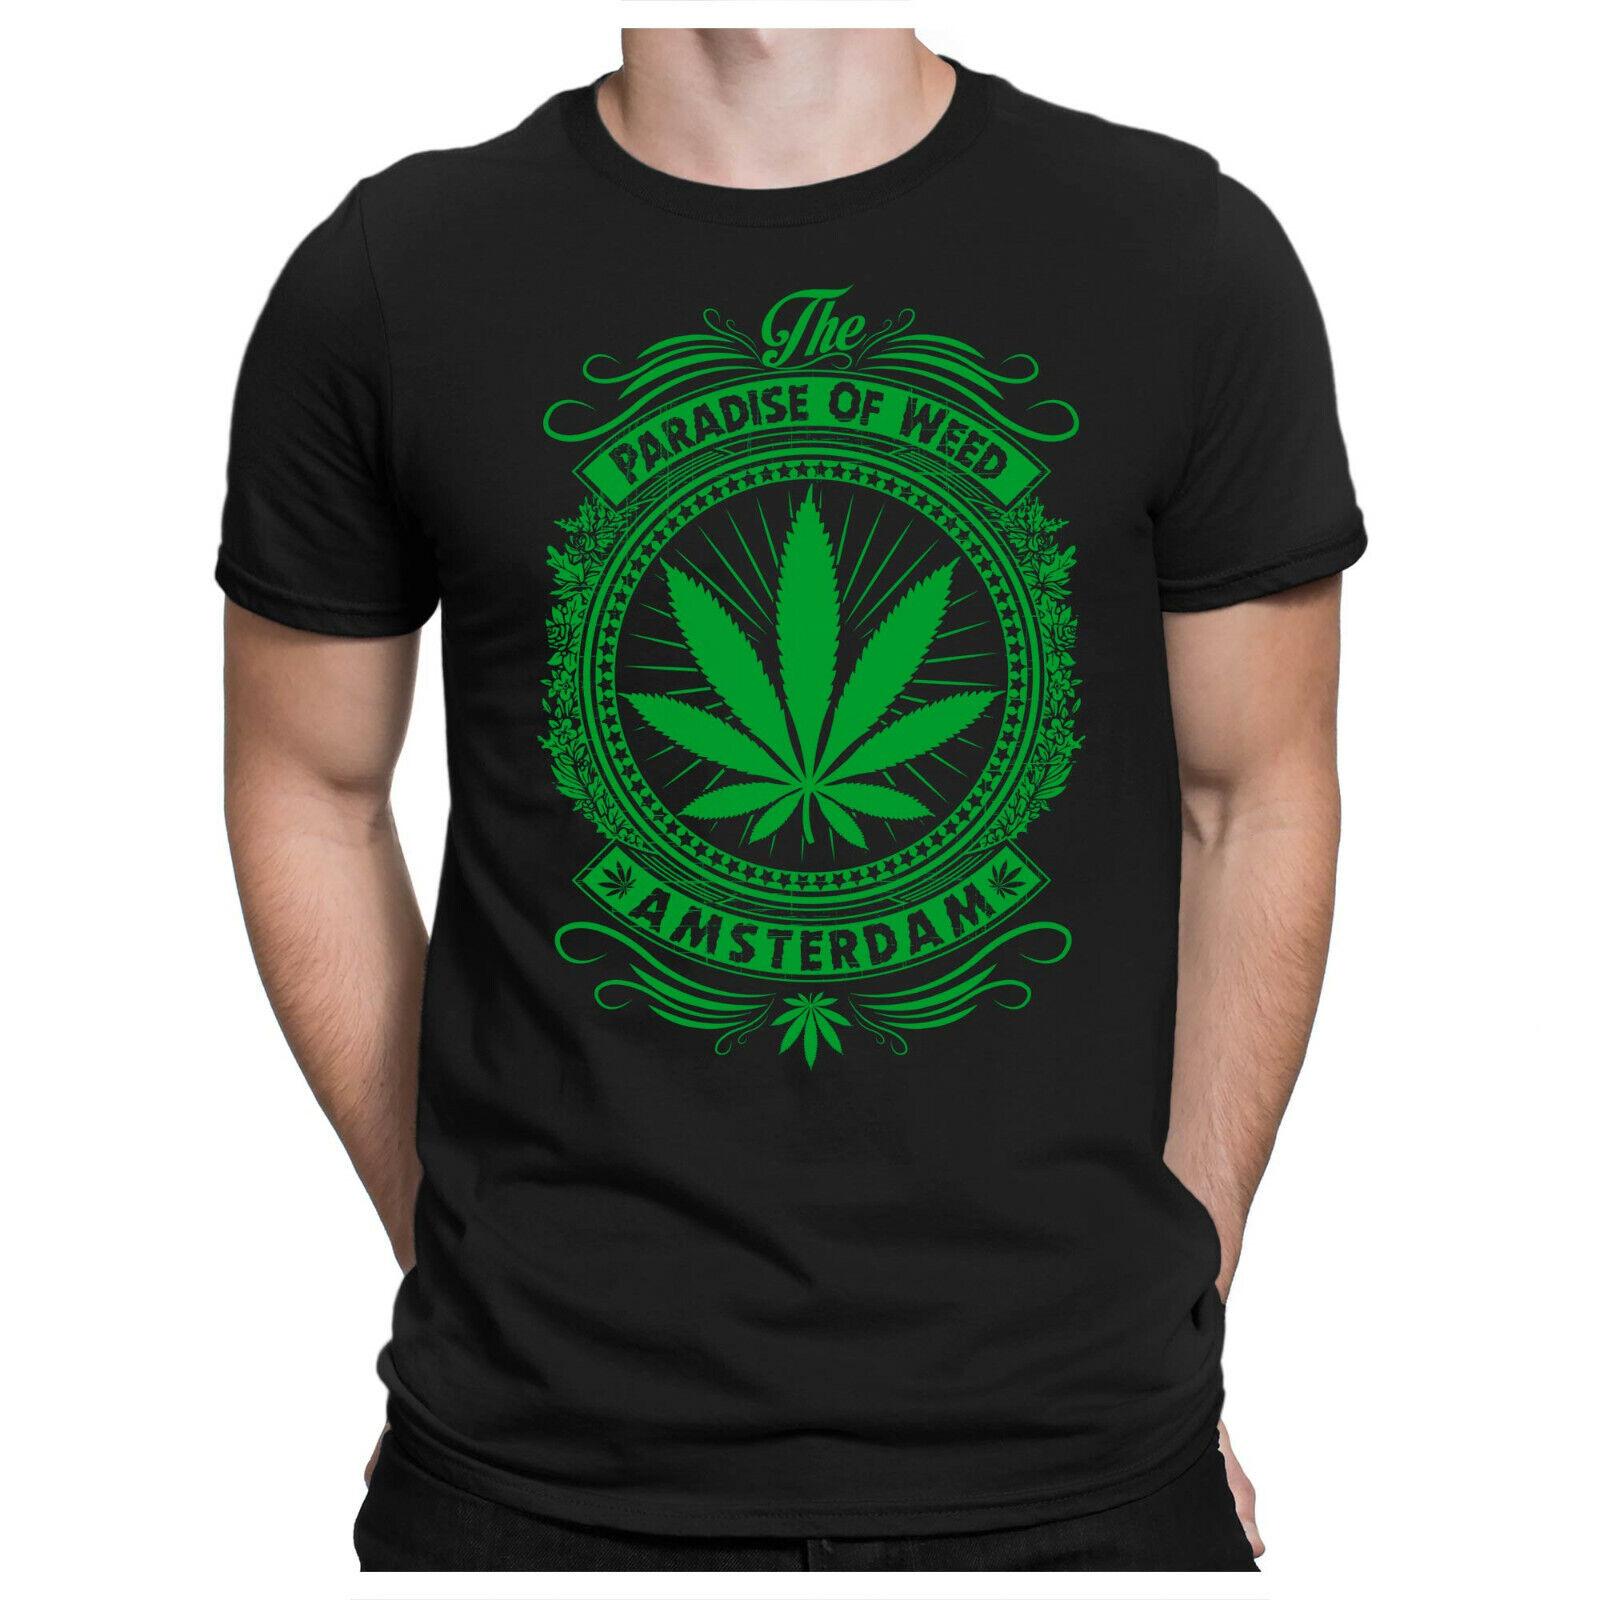 Weed Paradise Herren Fun T-Shirt - Amsterdam Holland 420 Cannabis Thc - PAPAYANA